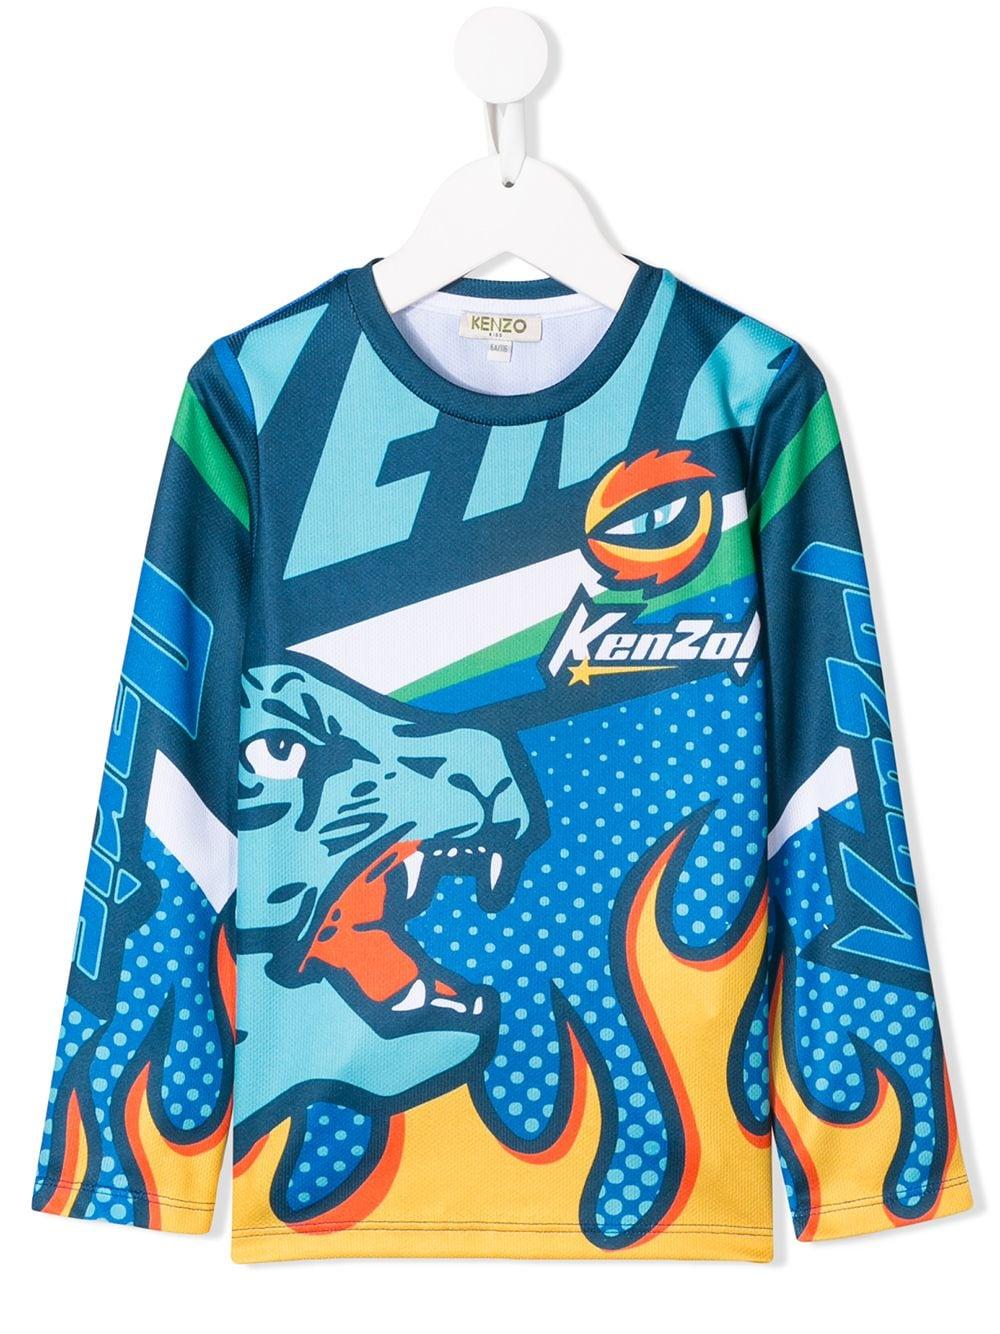 KENZO Kids | Kenzo Kids футболка с длинными рукавами и принтом пламени | Clouty